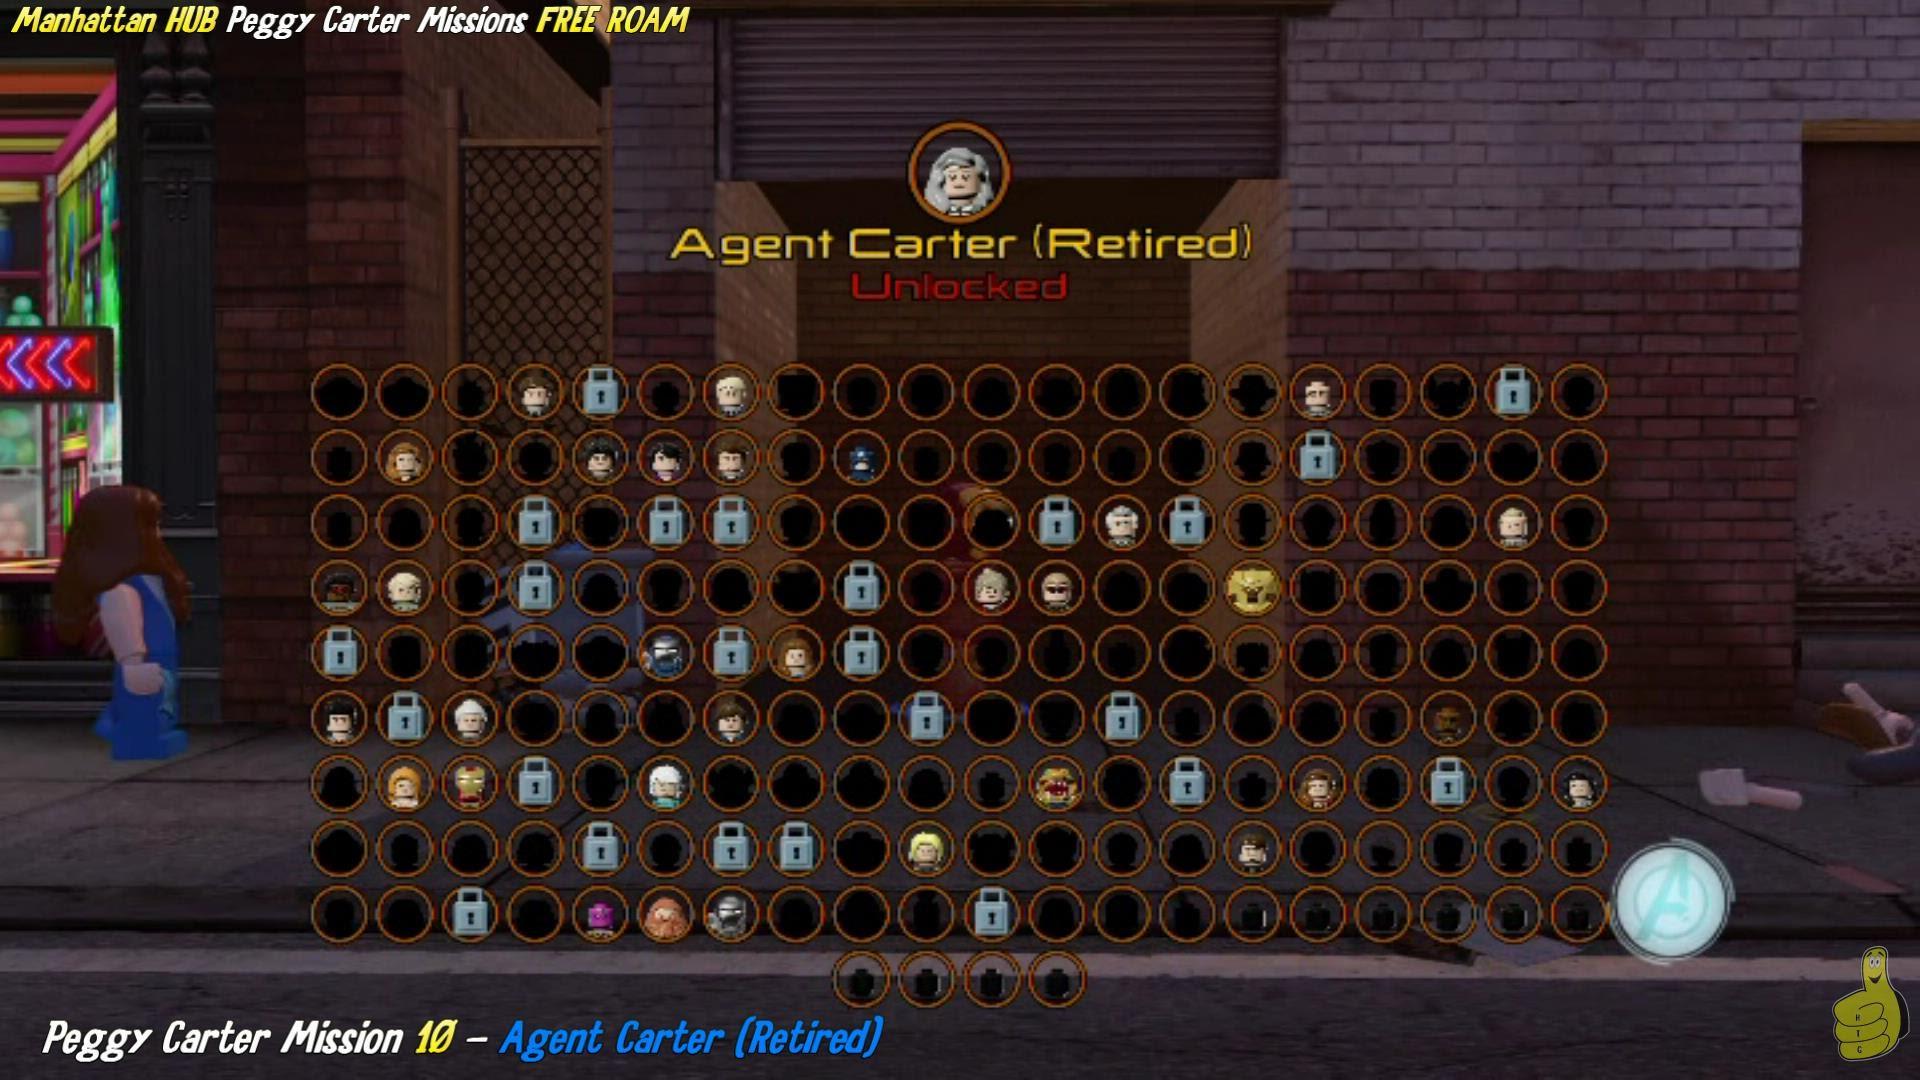 Lego Marvel Avengers: Manhattan HUB / Agent Peggy Carter Missions FREE ROAM (All 10 Missions) – HTG